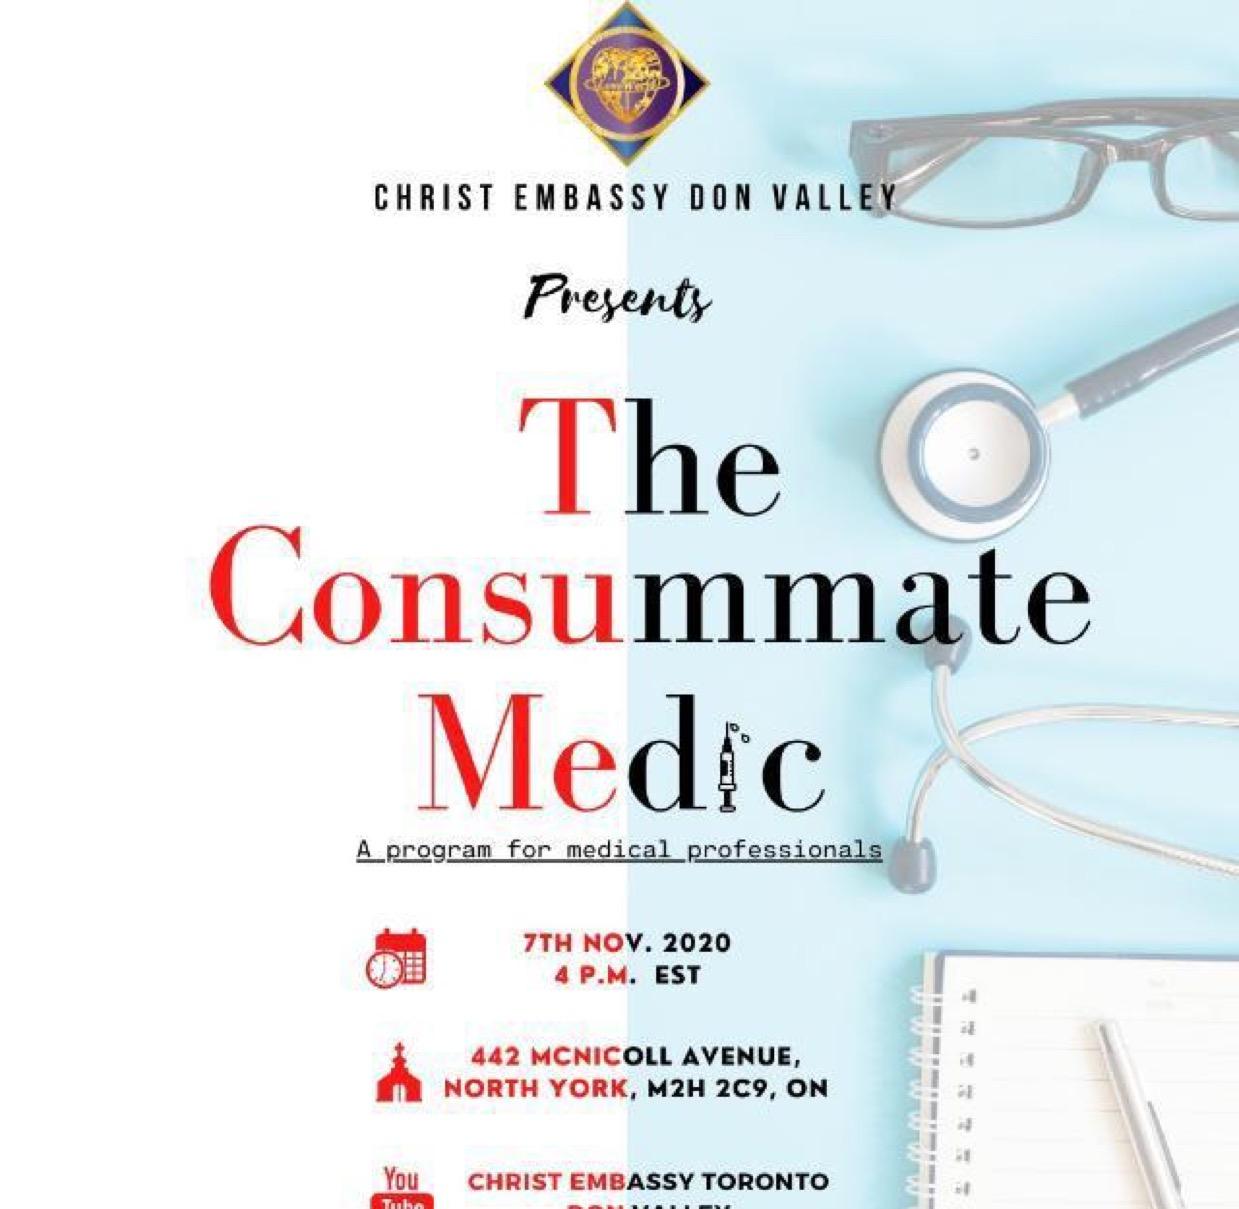 THE CONSUMMATE MEDIC...a seminar that